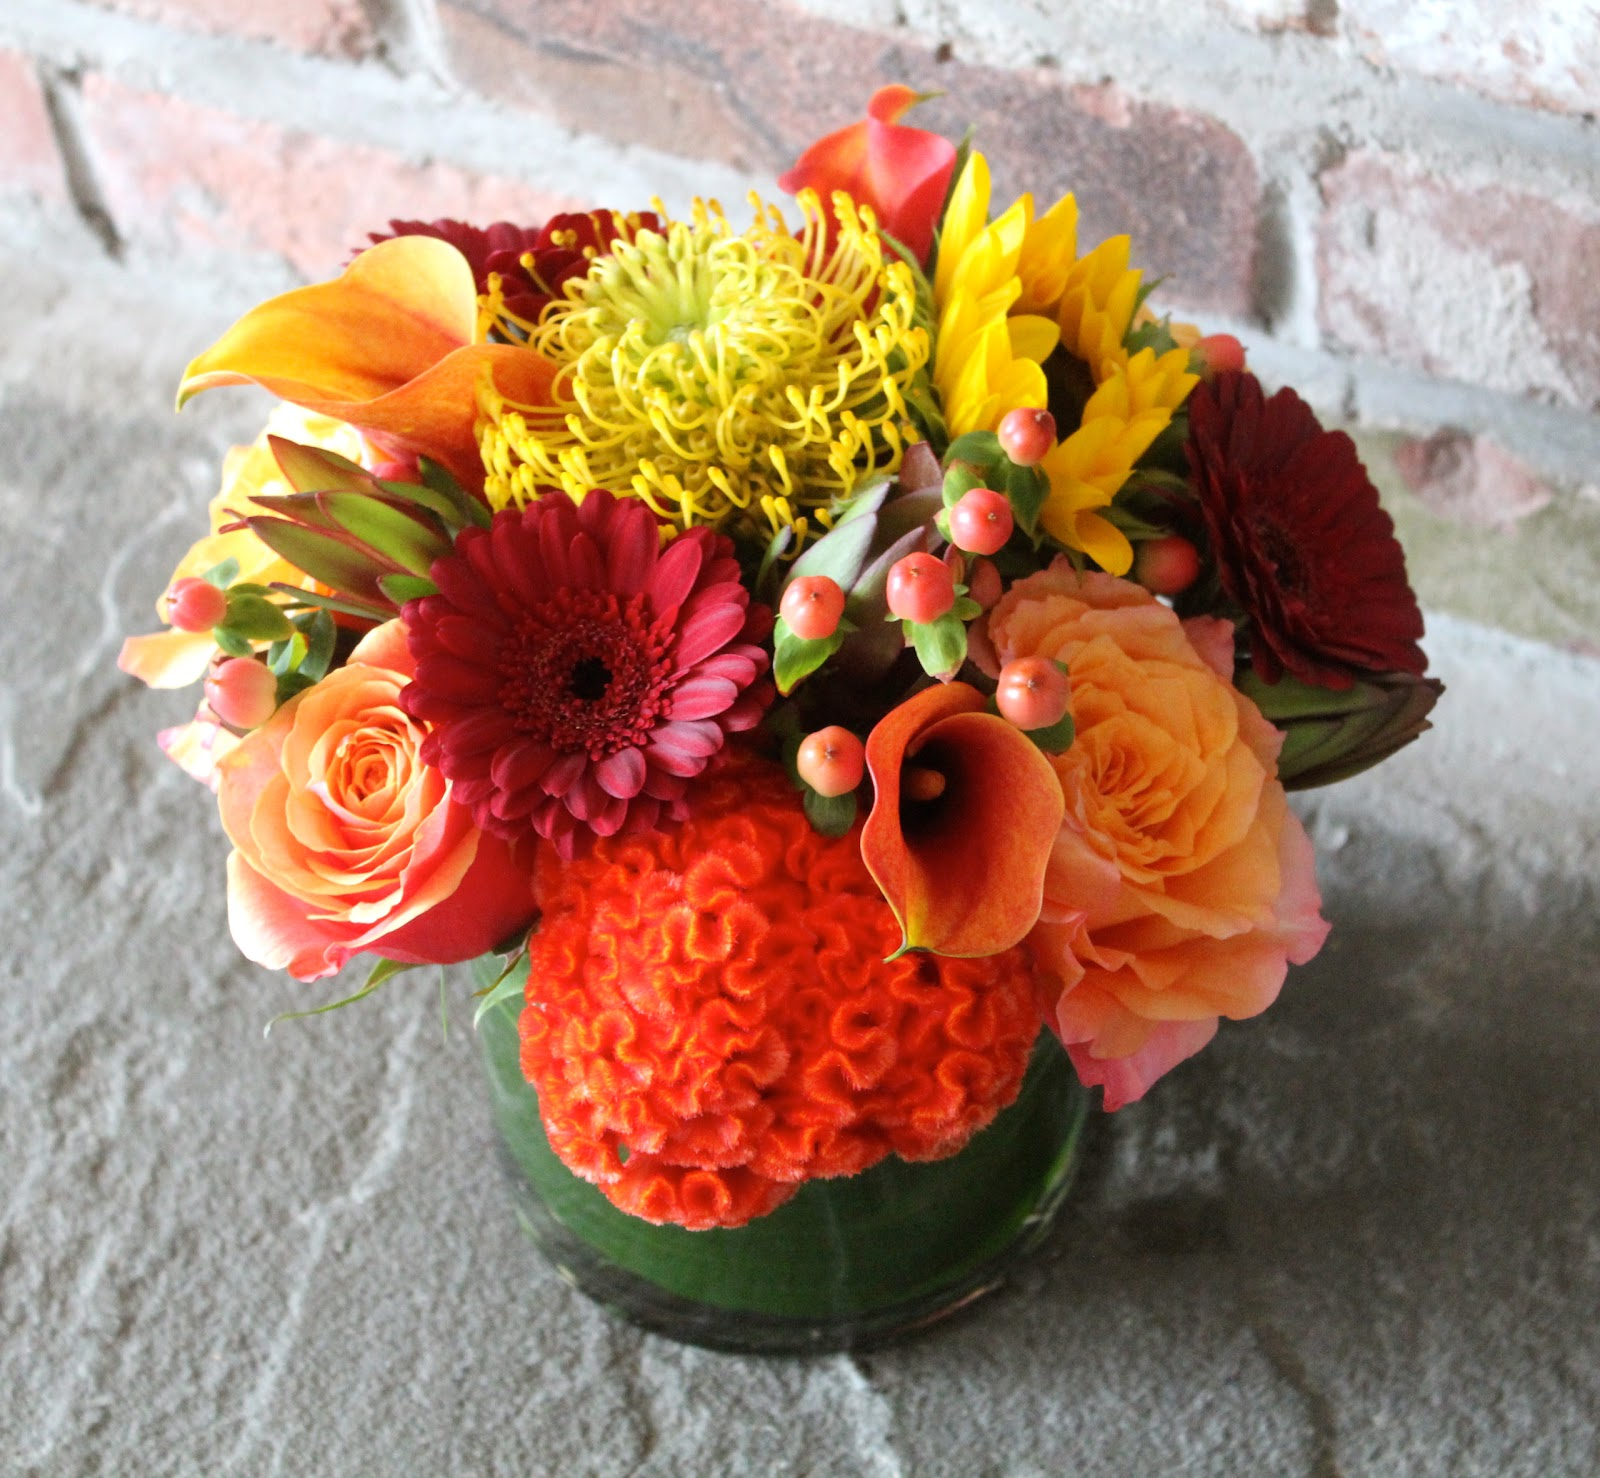 Wedding Flowers For November: Allison Phalen Floral Design: November 2012